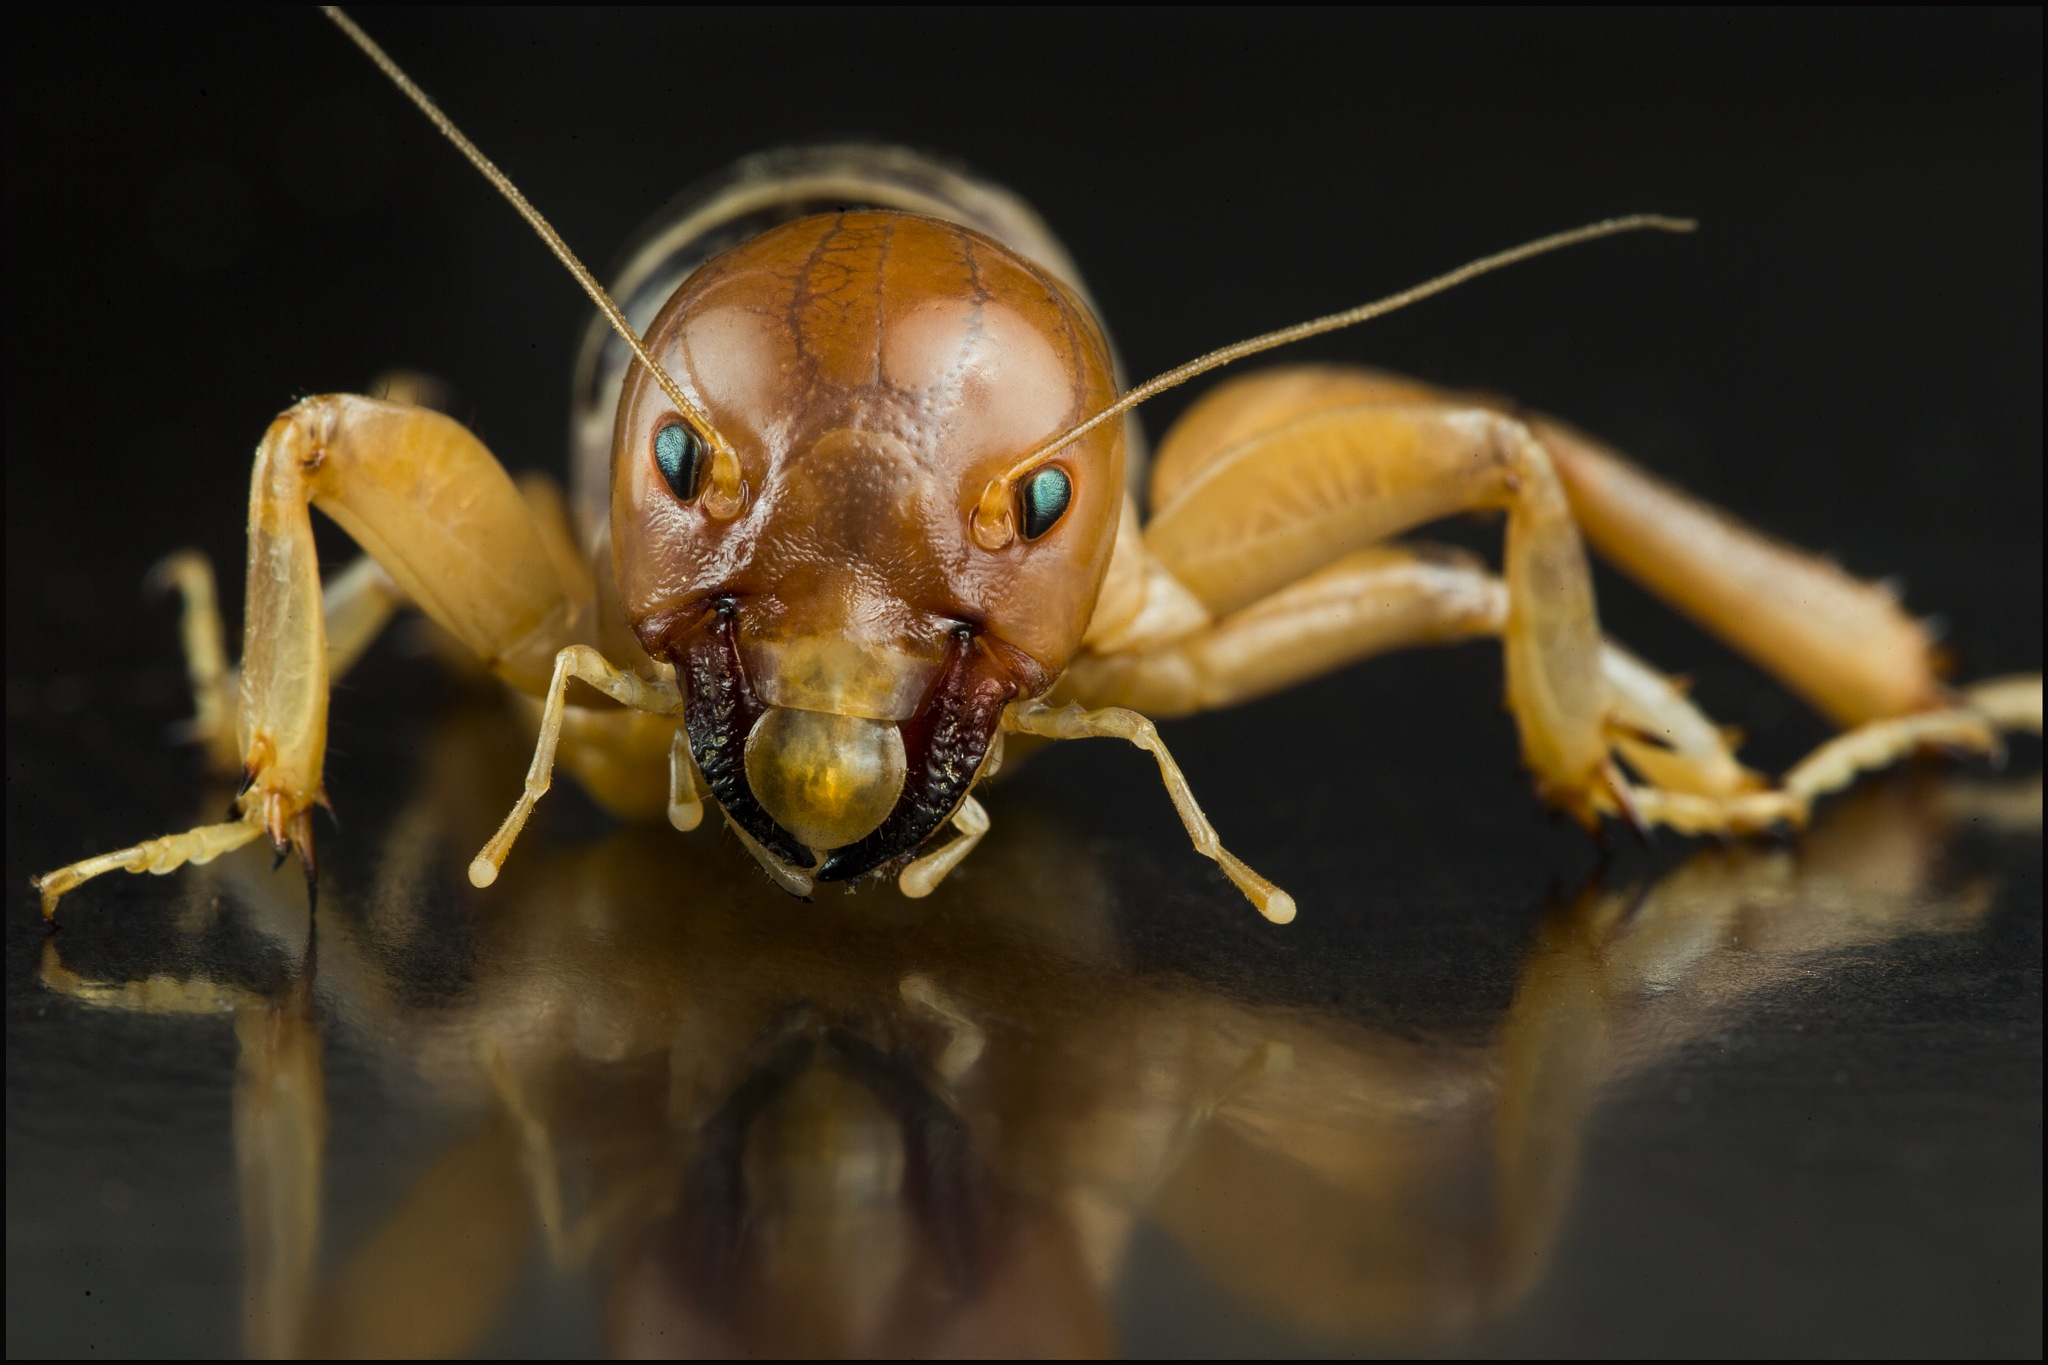 Jerusalem Cricket - also called Potato Bug by Michael Helms